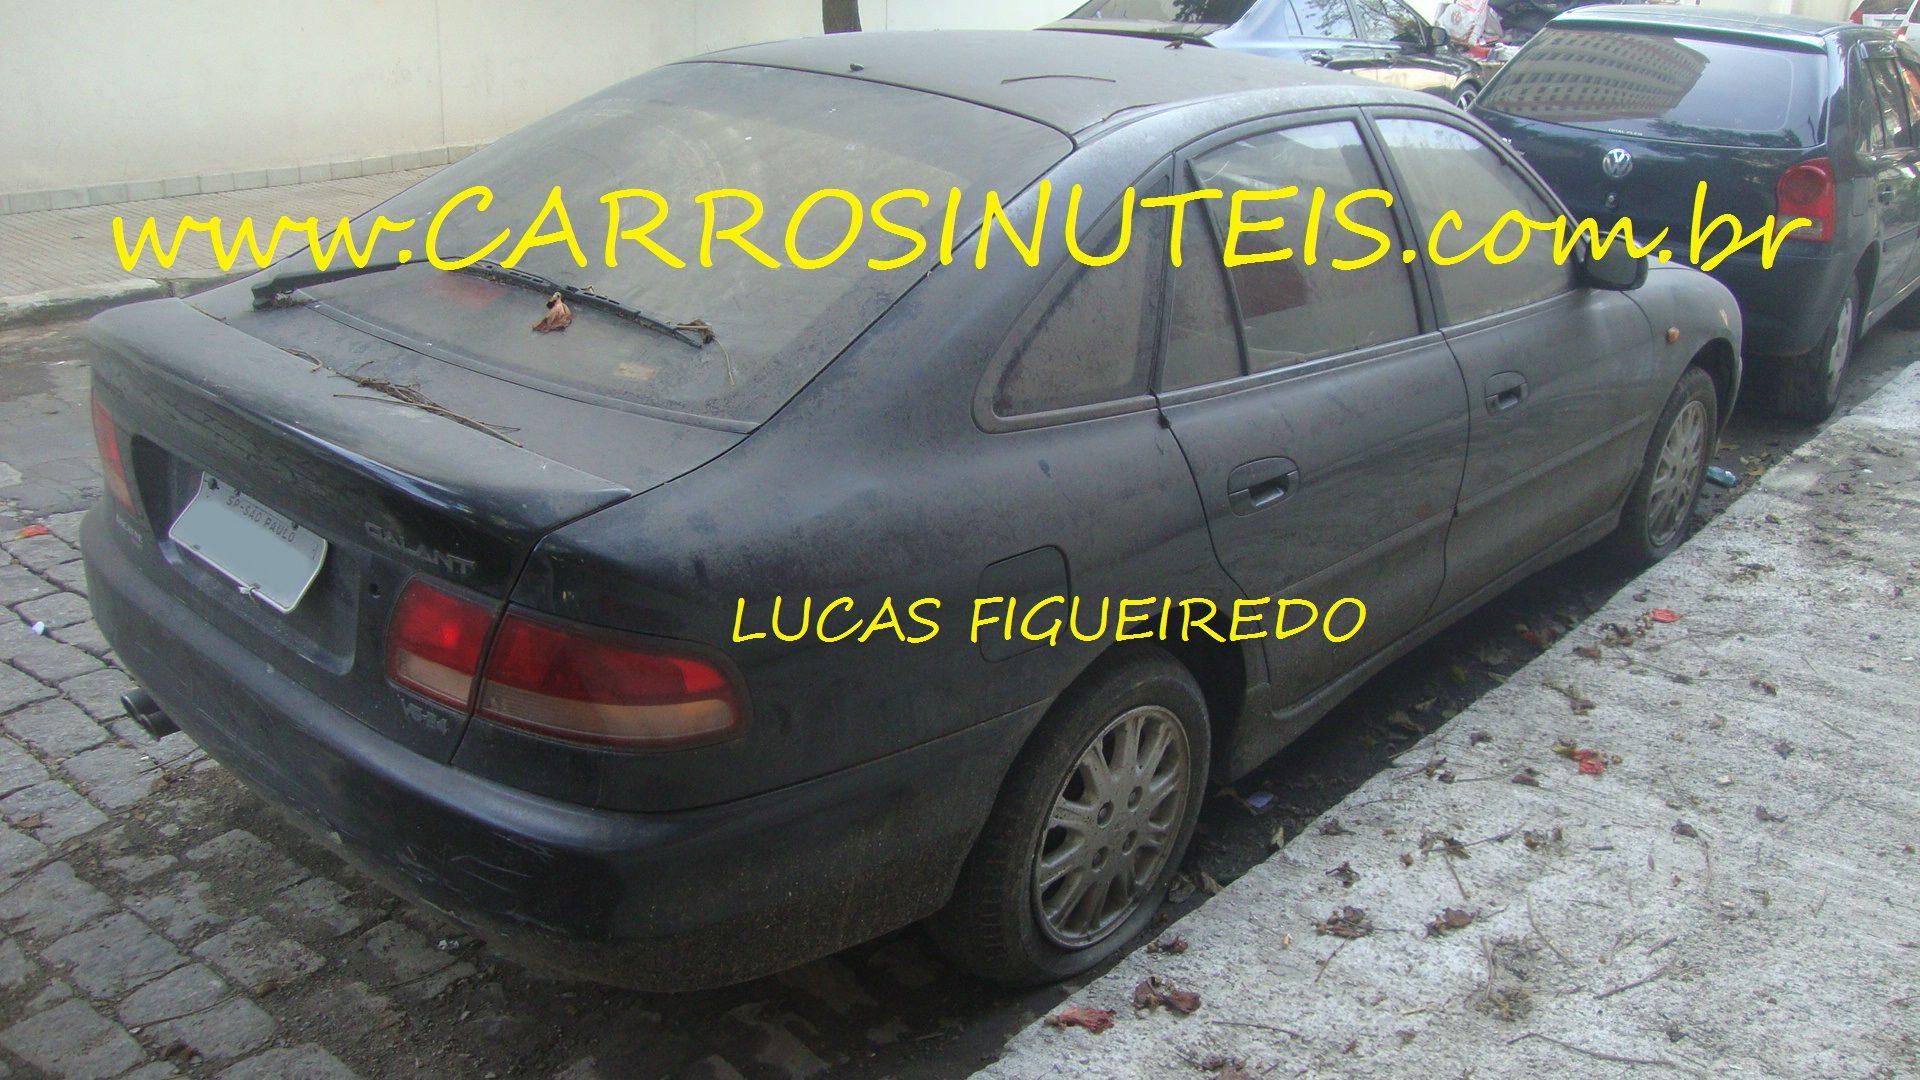 Lucas_Galant_Sao-Paulo_Capital_04 Mitsubishi Galant V6, São Paulo, SP.